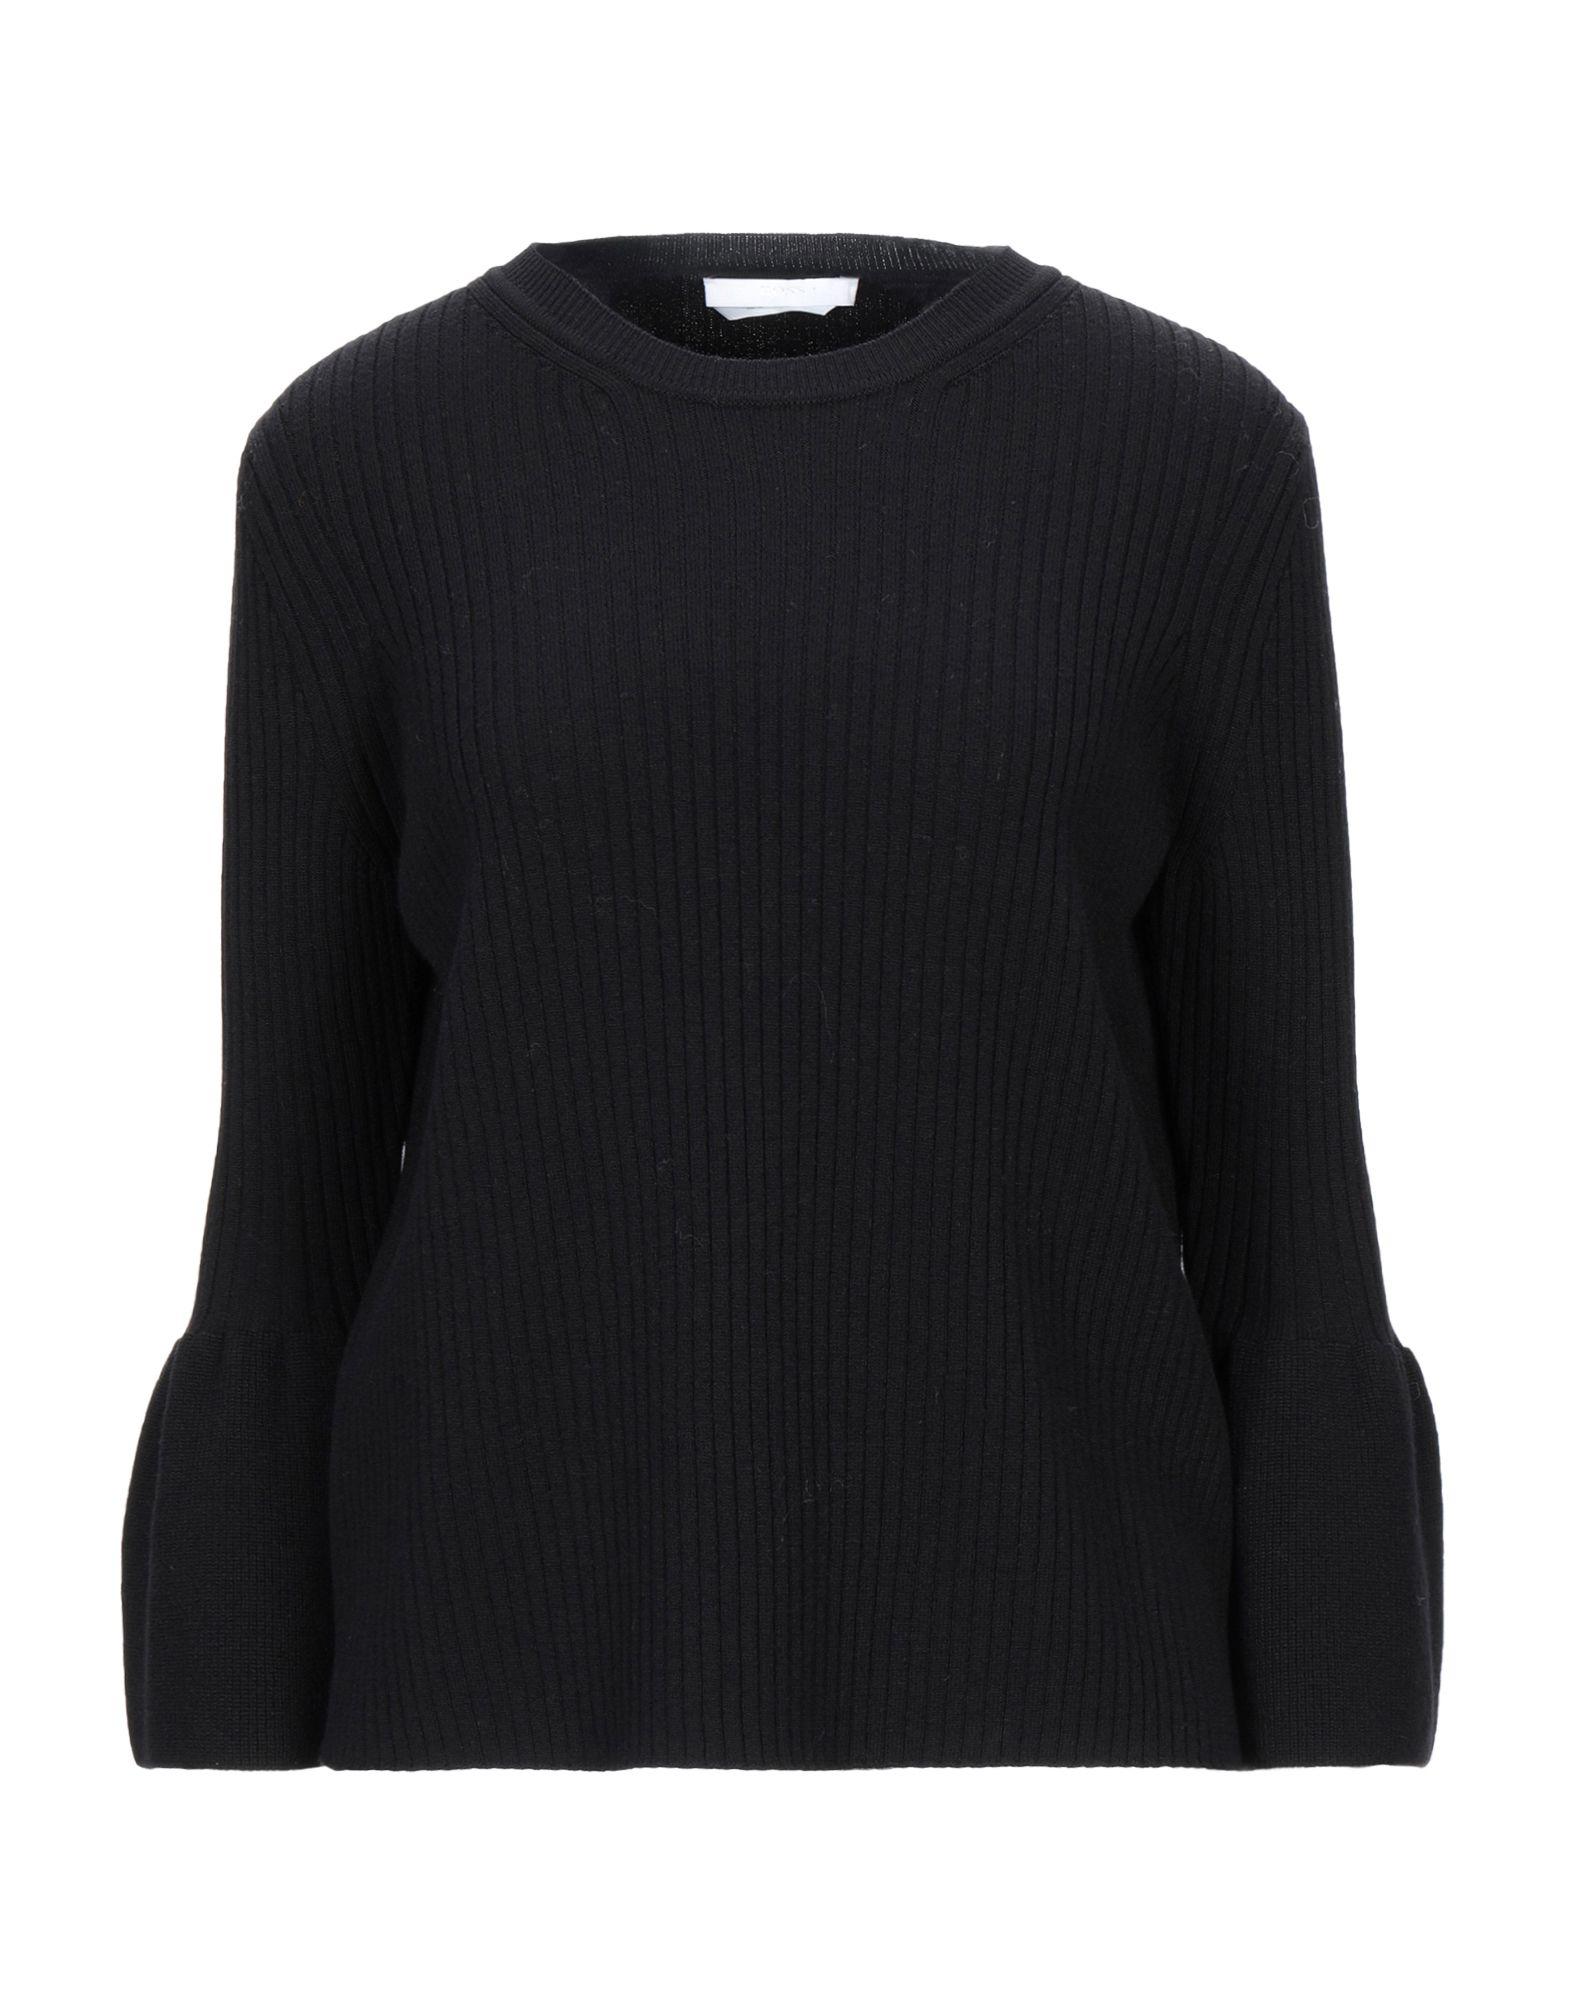 BOSS HUGO BOSS Свитер boss hugo boss свитер